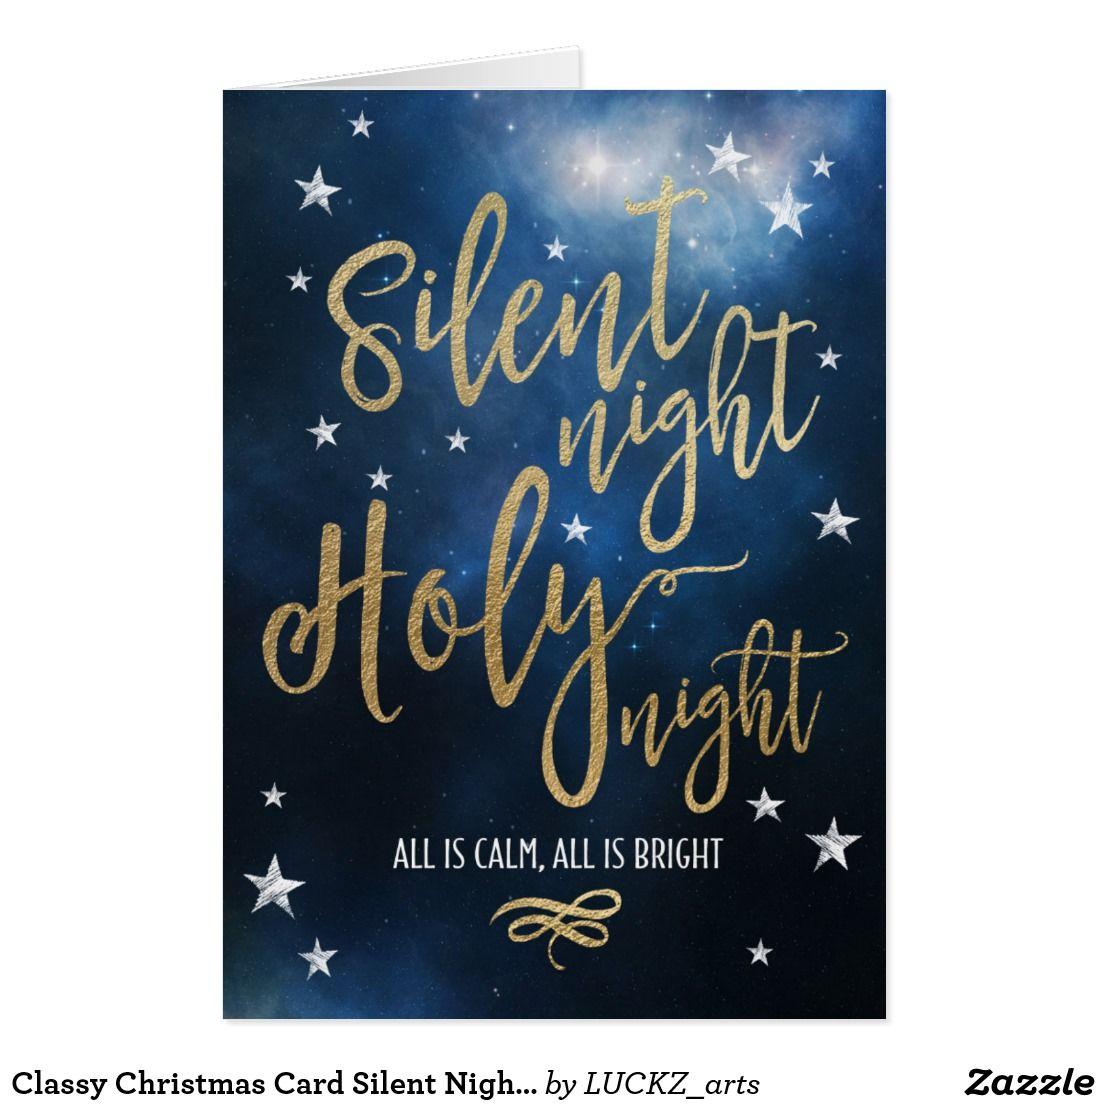 Christian Holiday Card Silent Night Holy Night Zazzle Com Christian Holiday Card Christian Christmas Christmas Greetings Christian